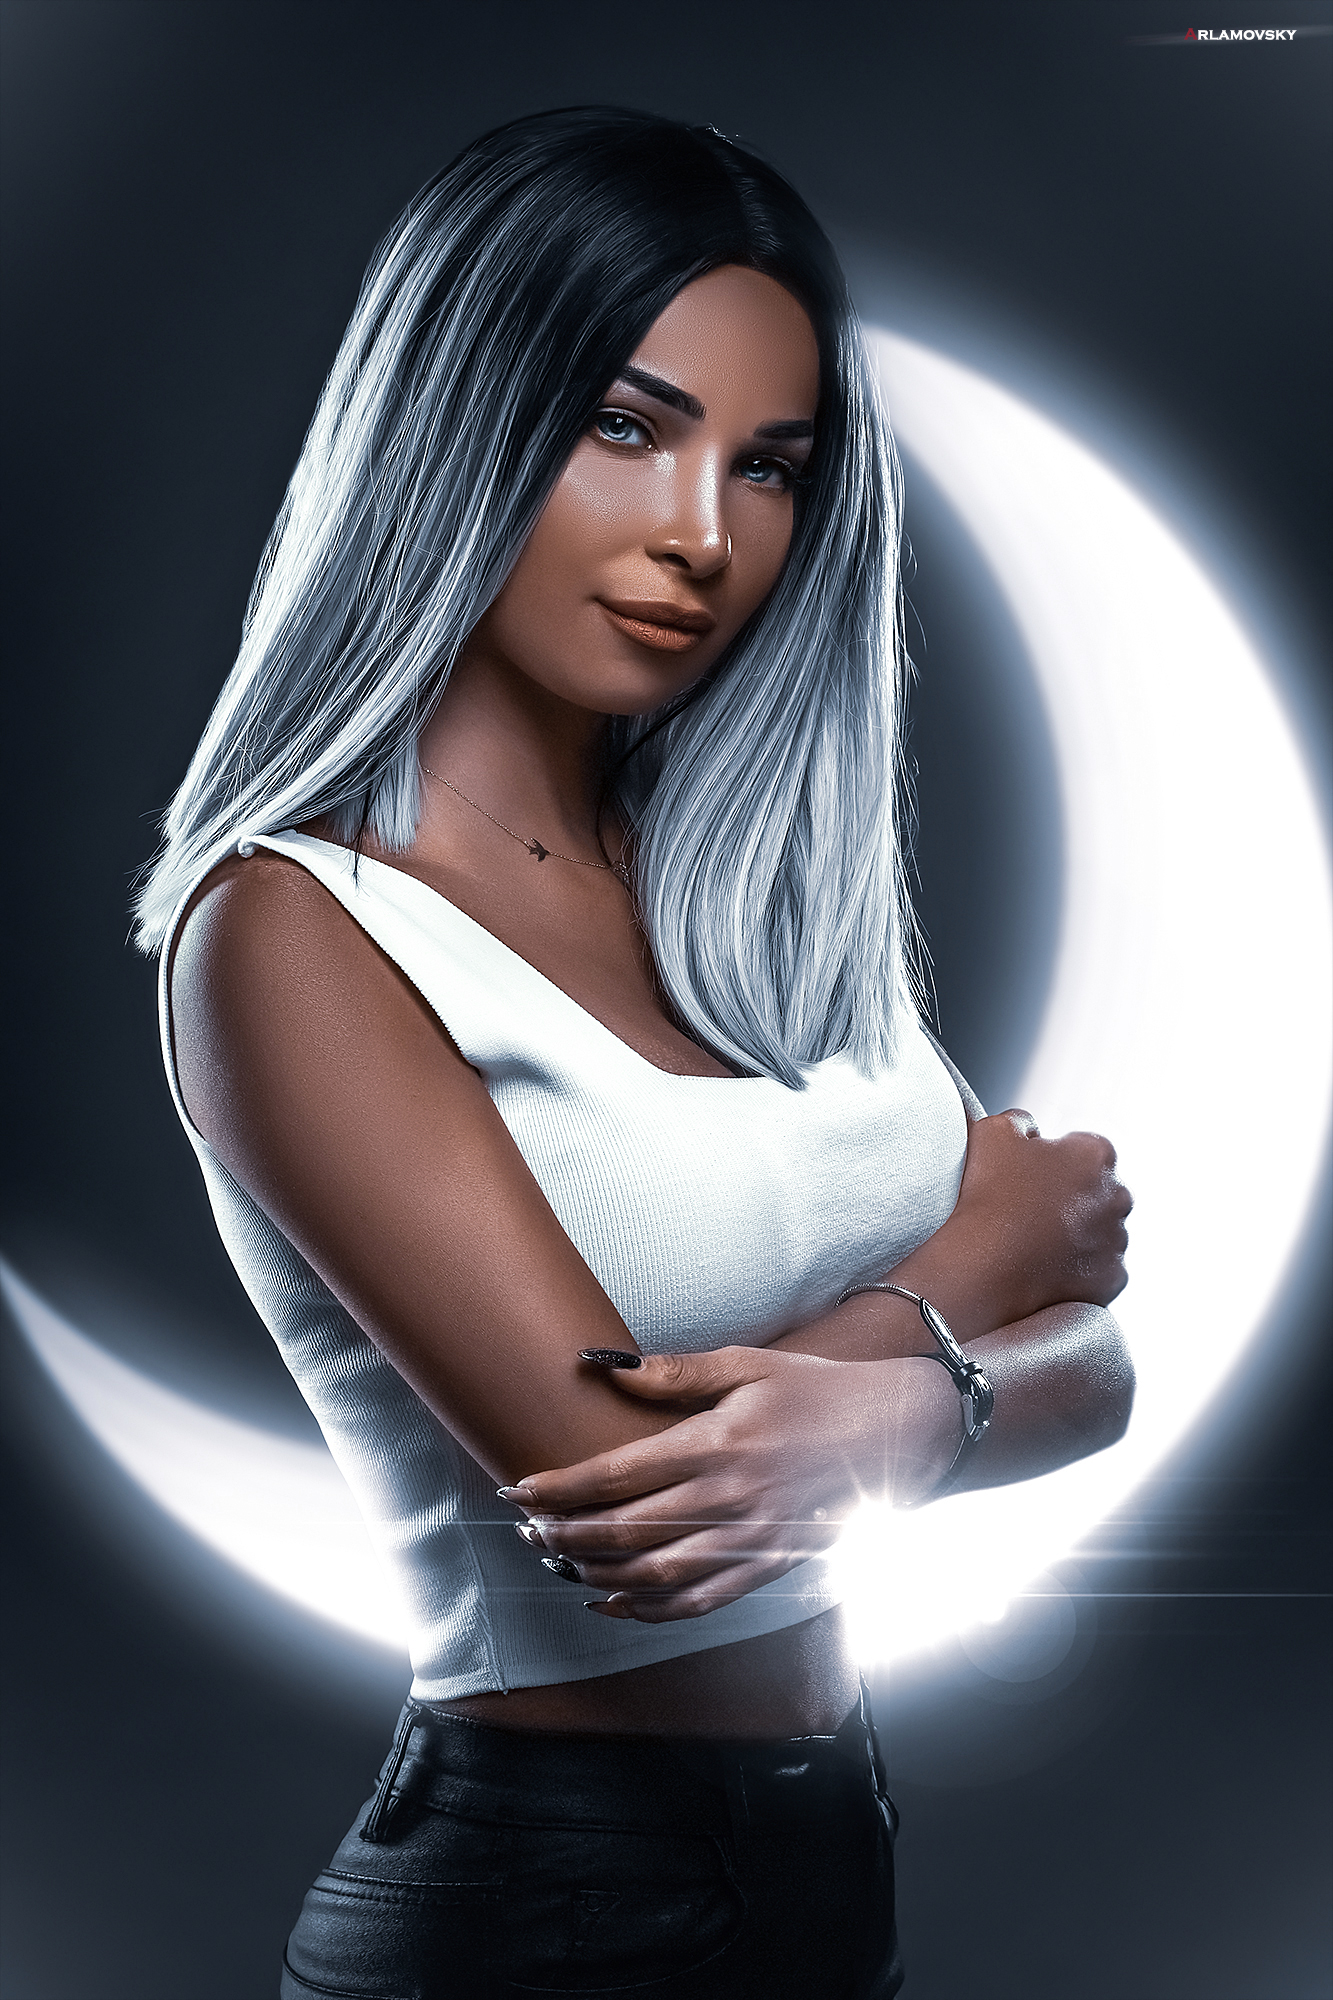 Arlamovsky Gray Eyes Women Nails Hair Eyes Moon Rays Light Effects Mystic Eyes Digital Lips Retouchi 1333x2000